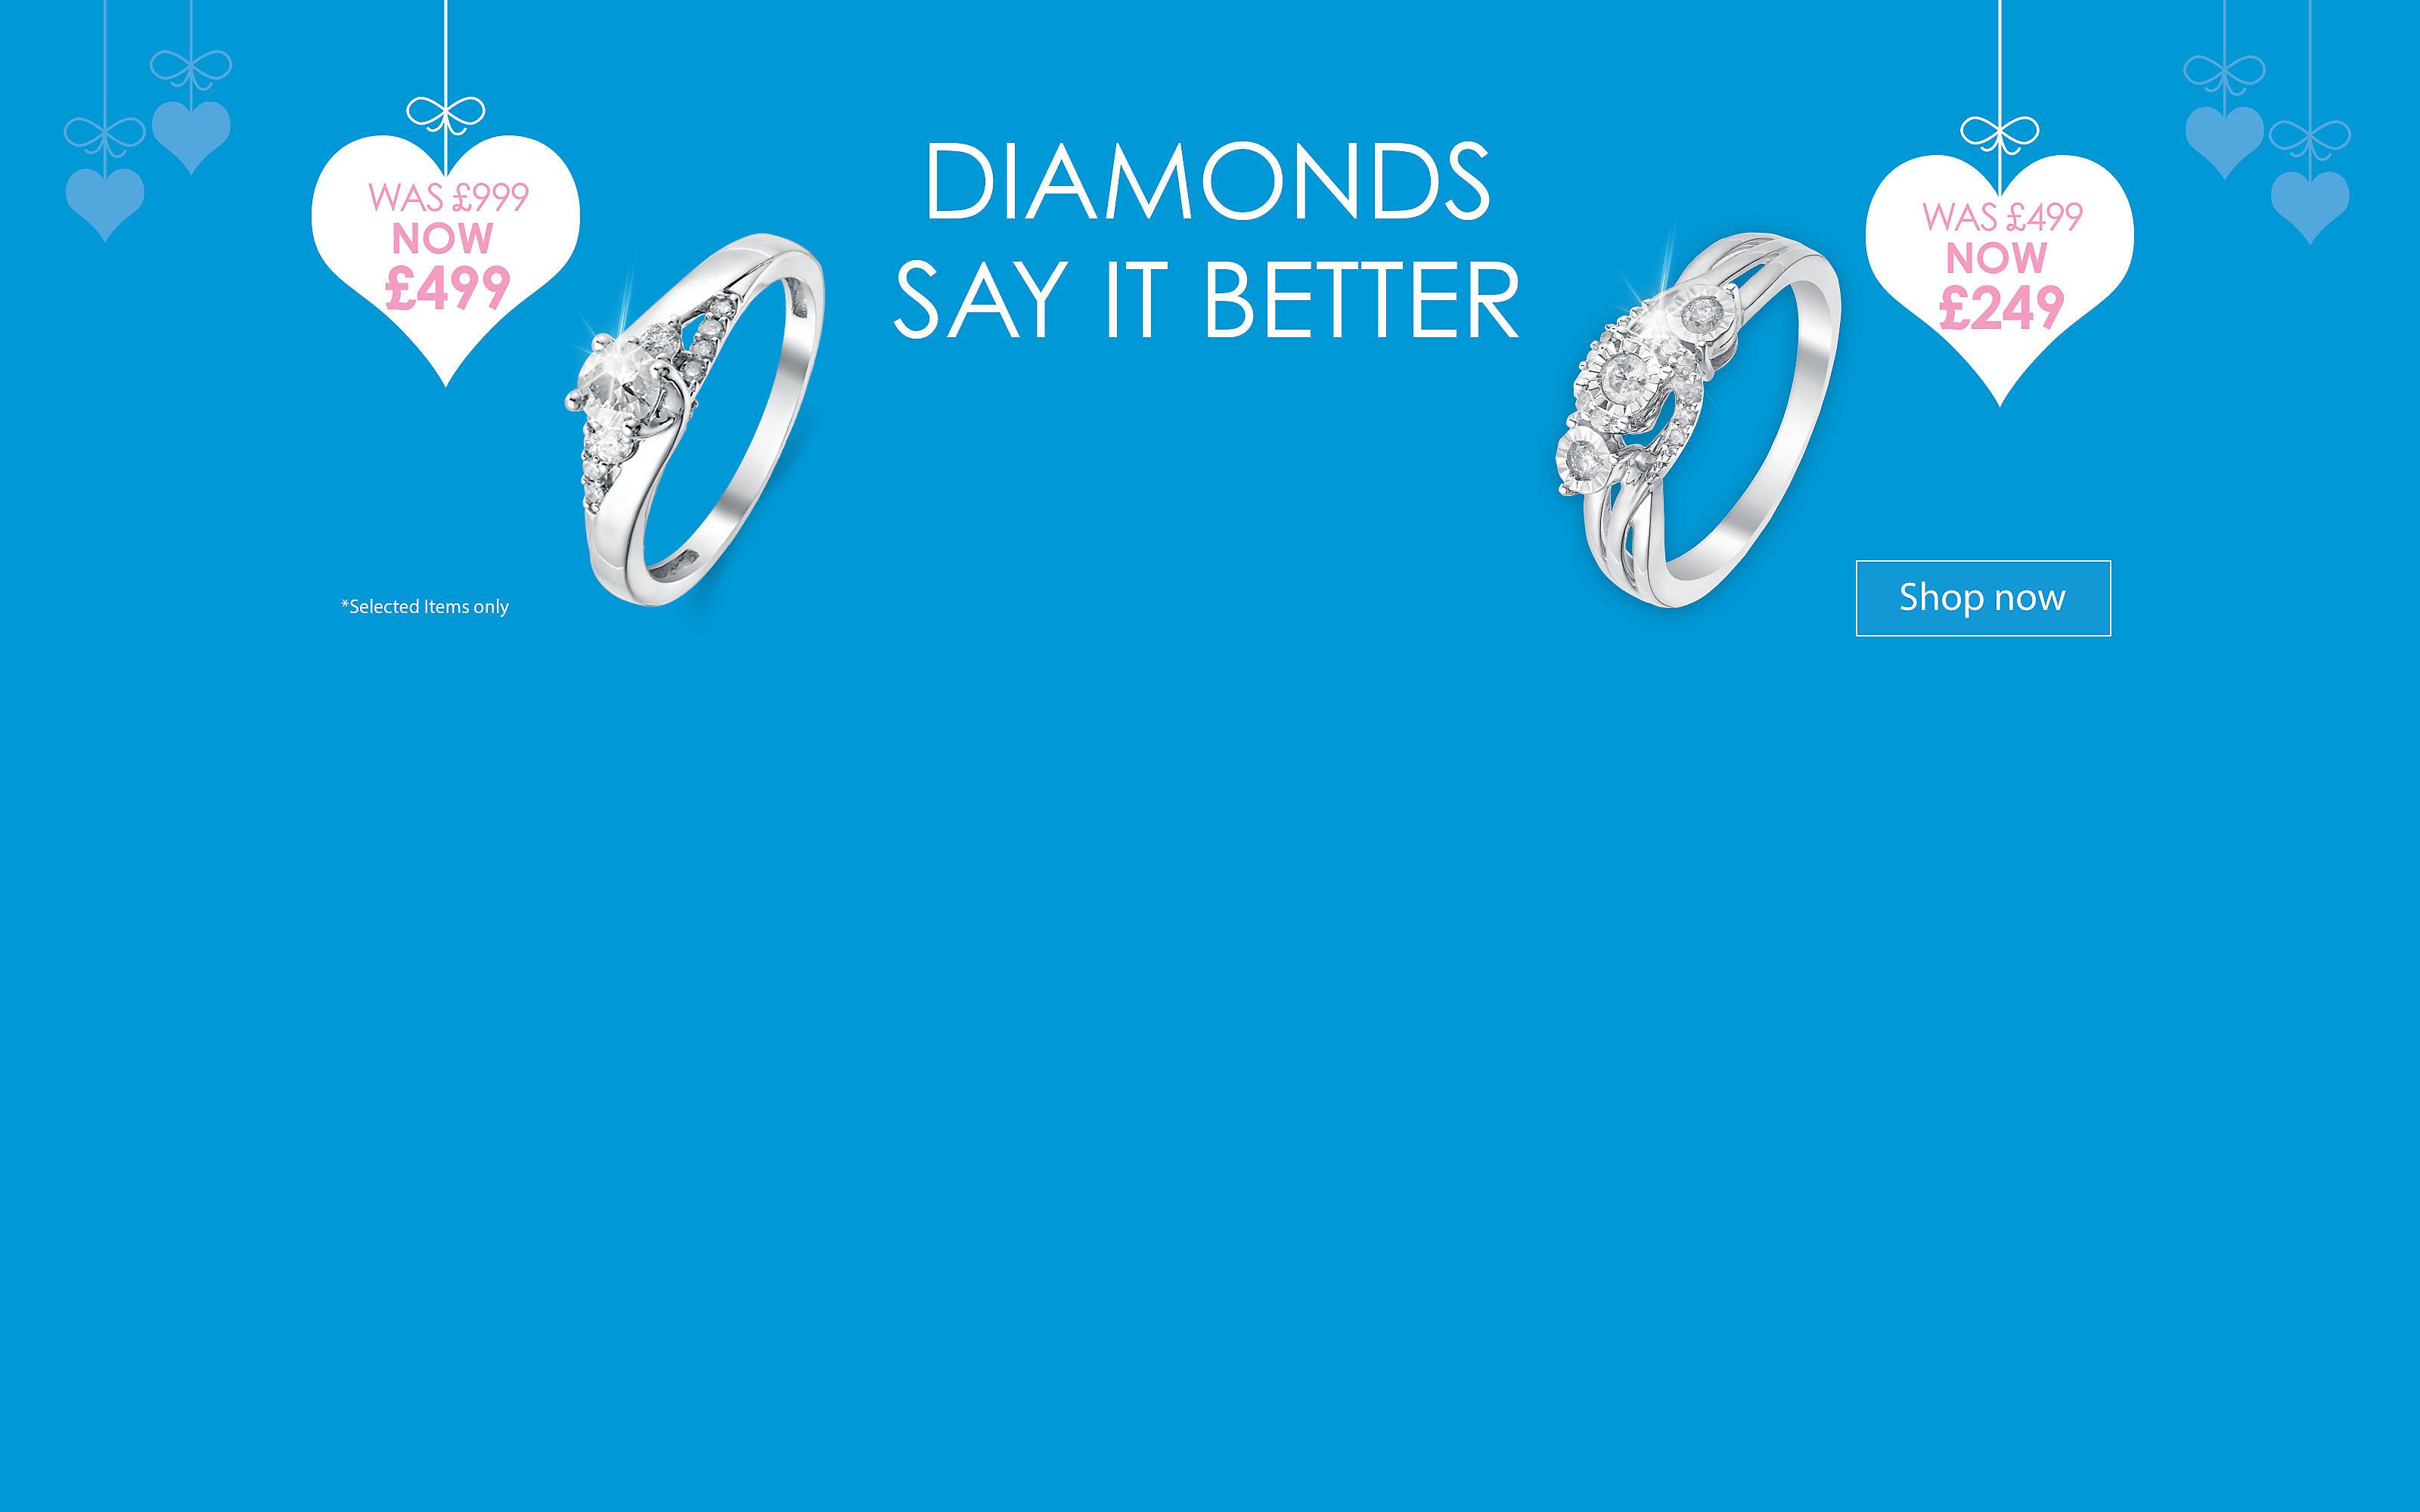 Diamonds say it Better